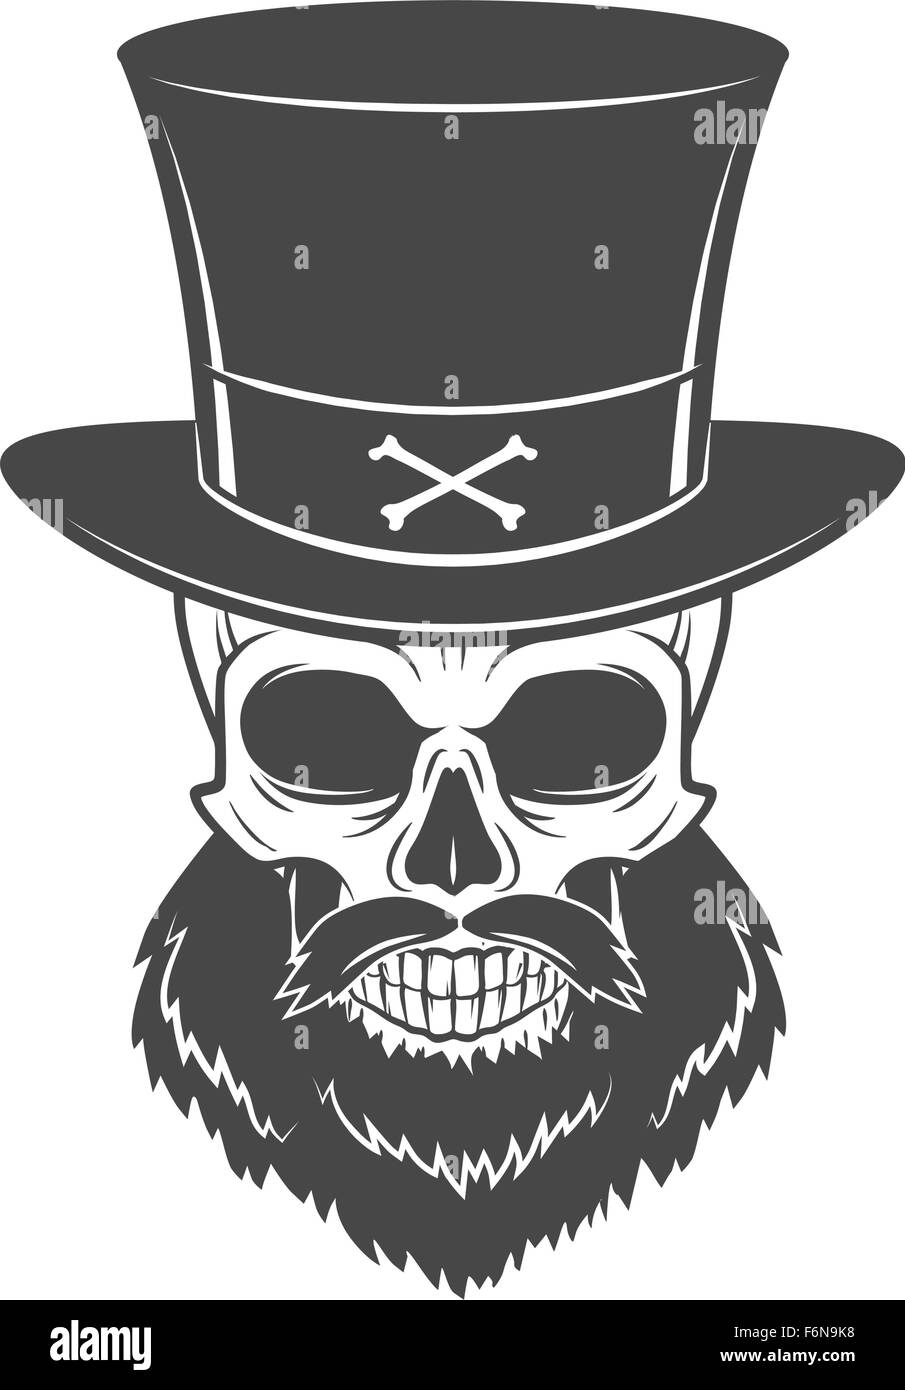 Outlaw Logo Design